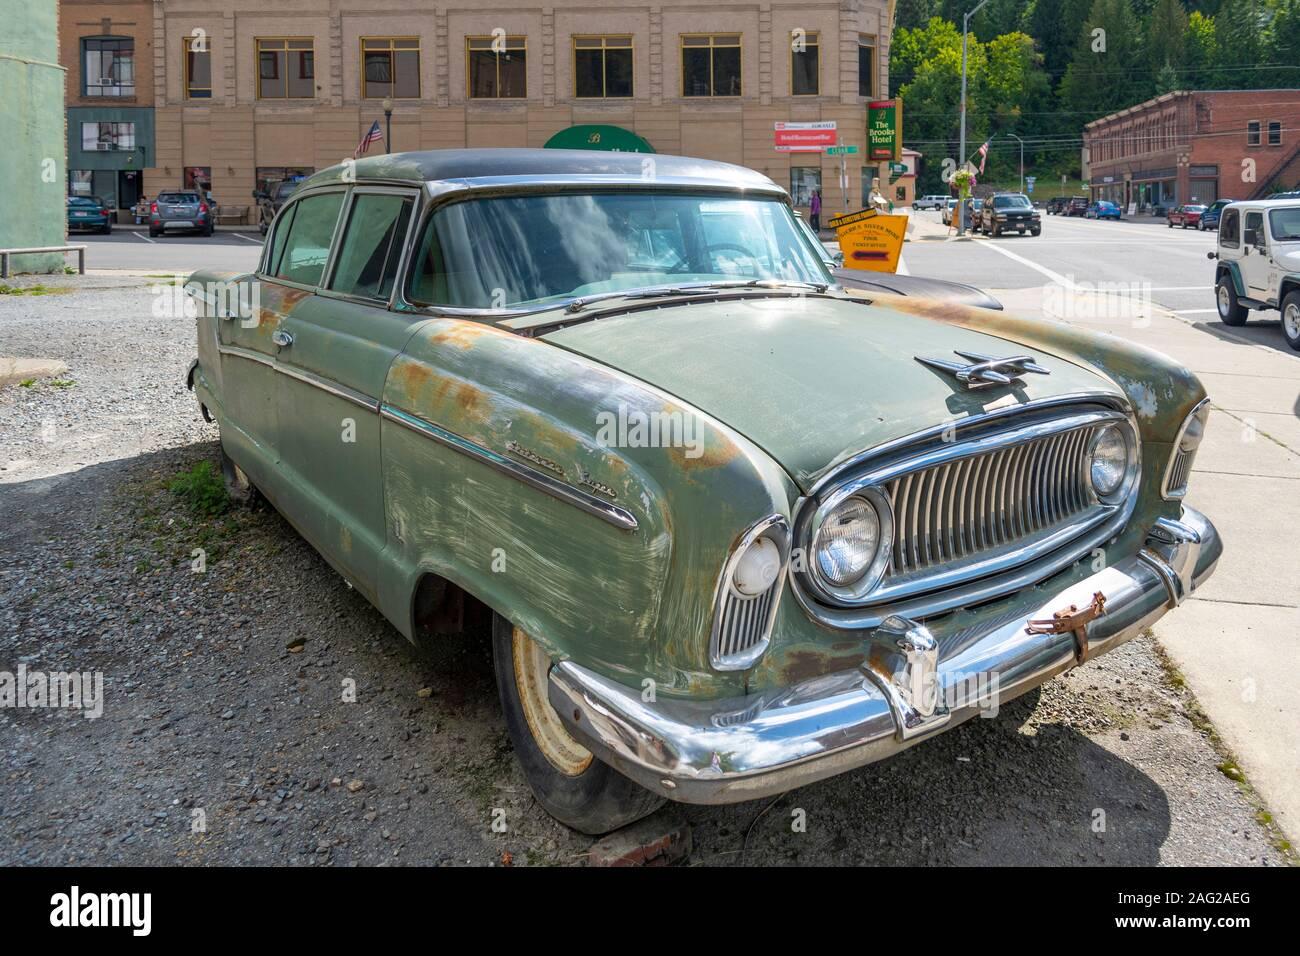 Wallace, Idaho - September 2 2019: A 1956 Nash Ambassador sits in a parking lot in the historic city of Wallace, Idaho, USA Stock Photo